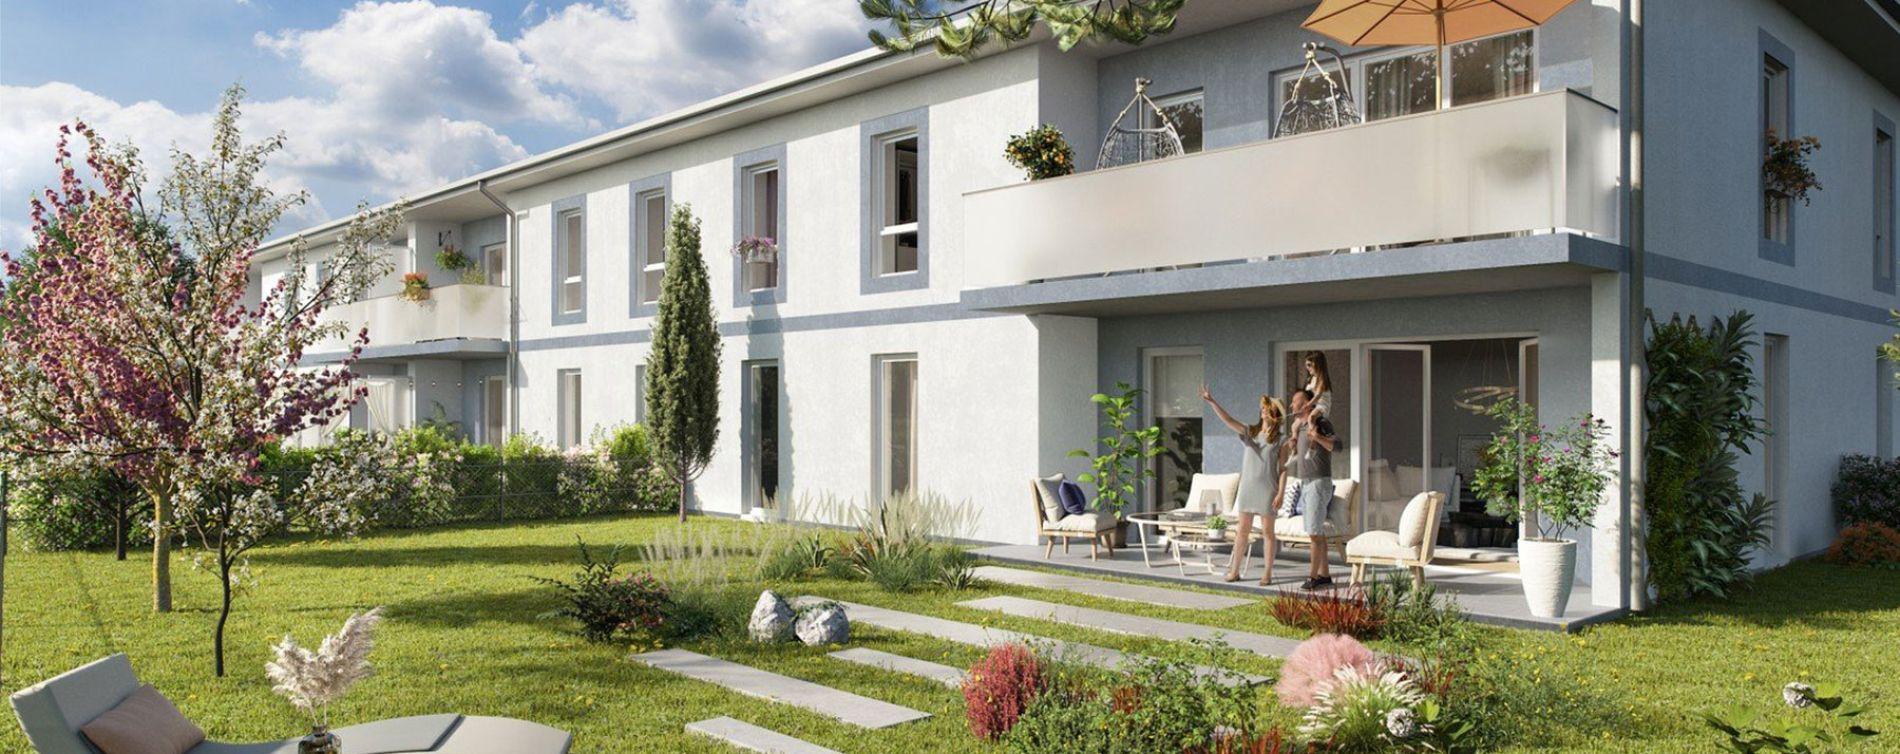 Saint-Jean-d'Illac : programme immobilier neuve « Euphoria »